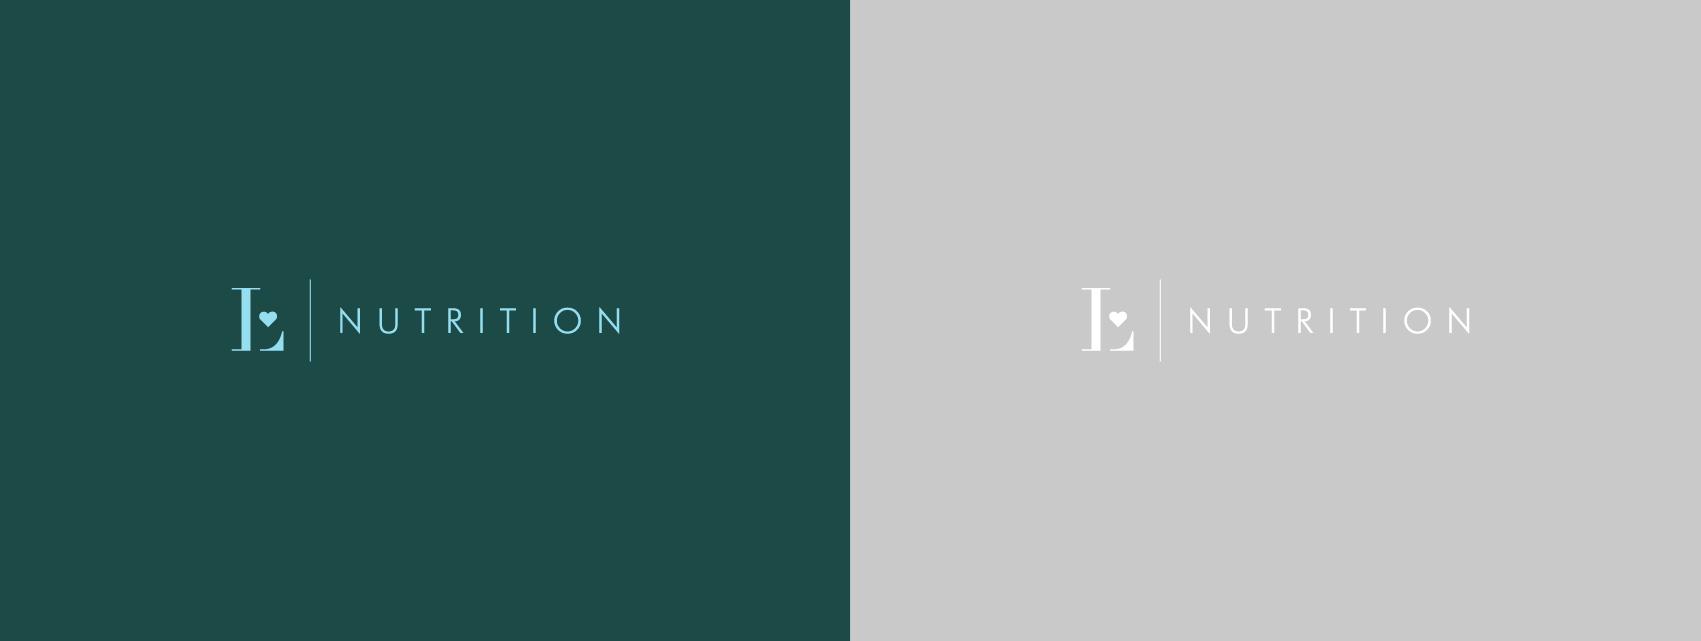 LRD Brand Identity Design